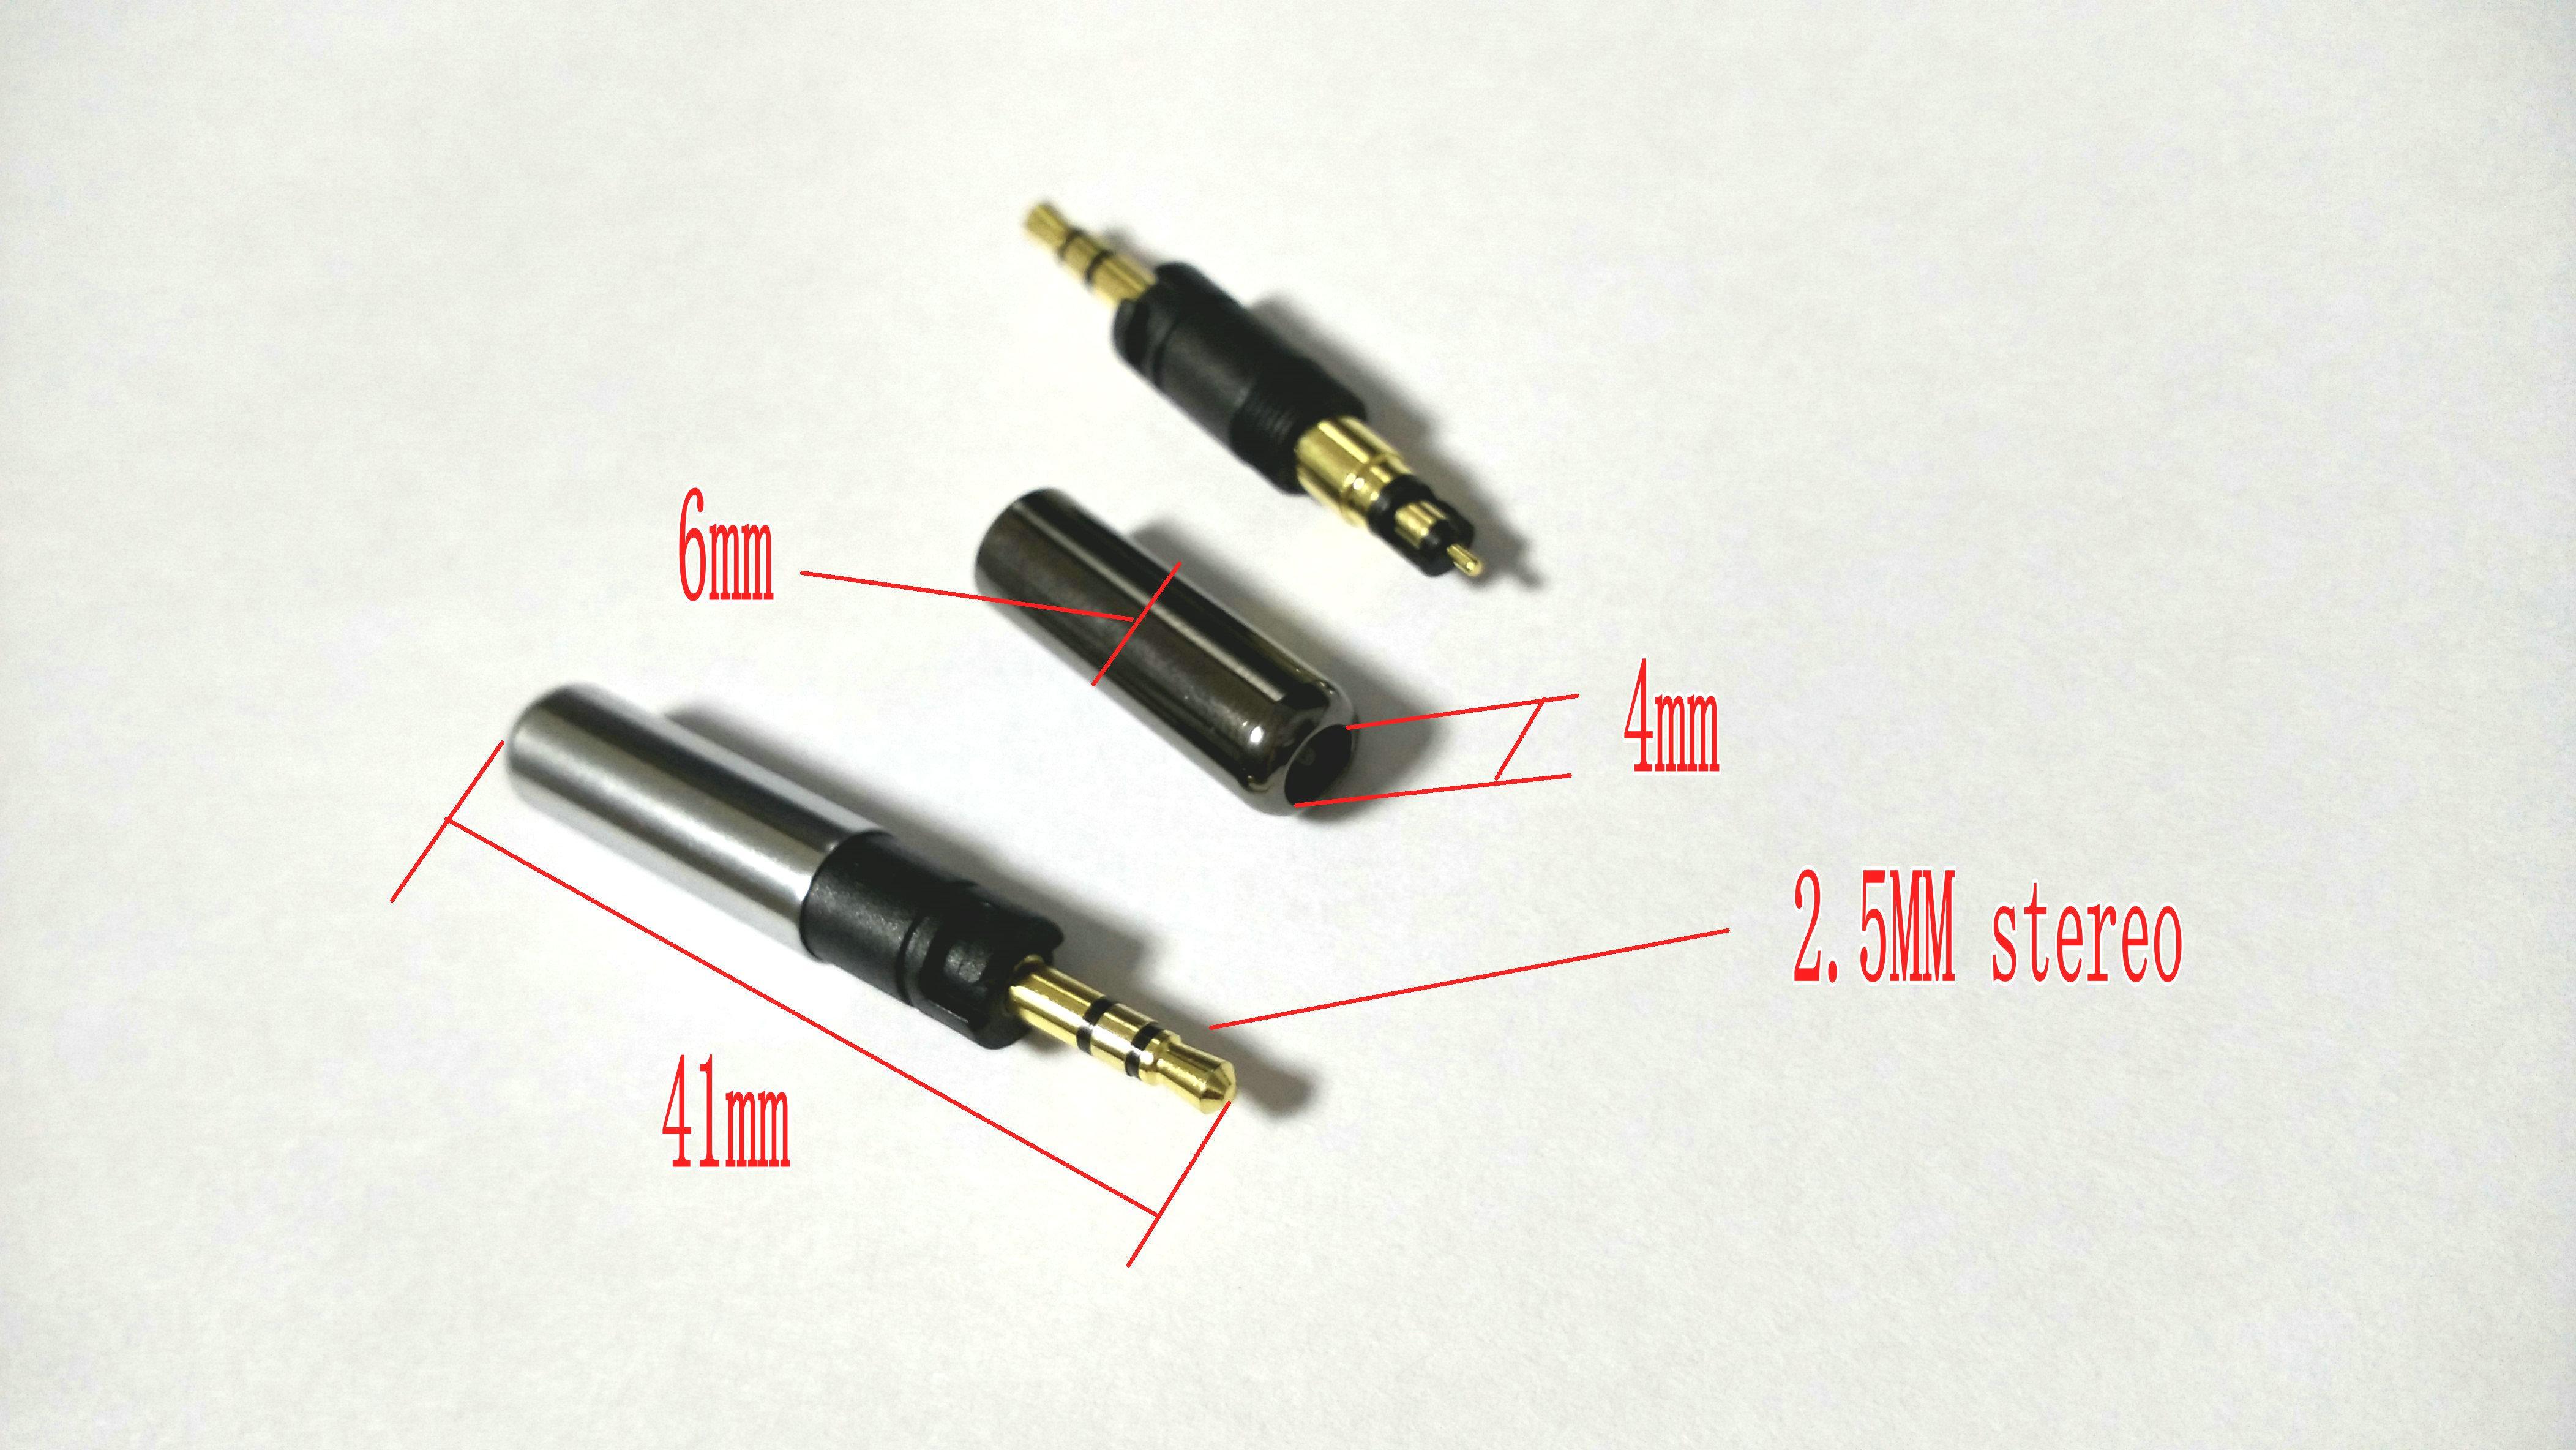 mini 2.5mm Stereo Repair Headphone Plug Cable Solder DIY connector